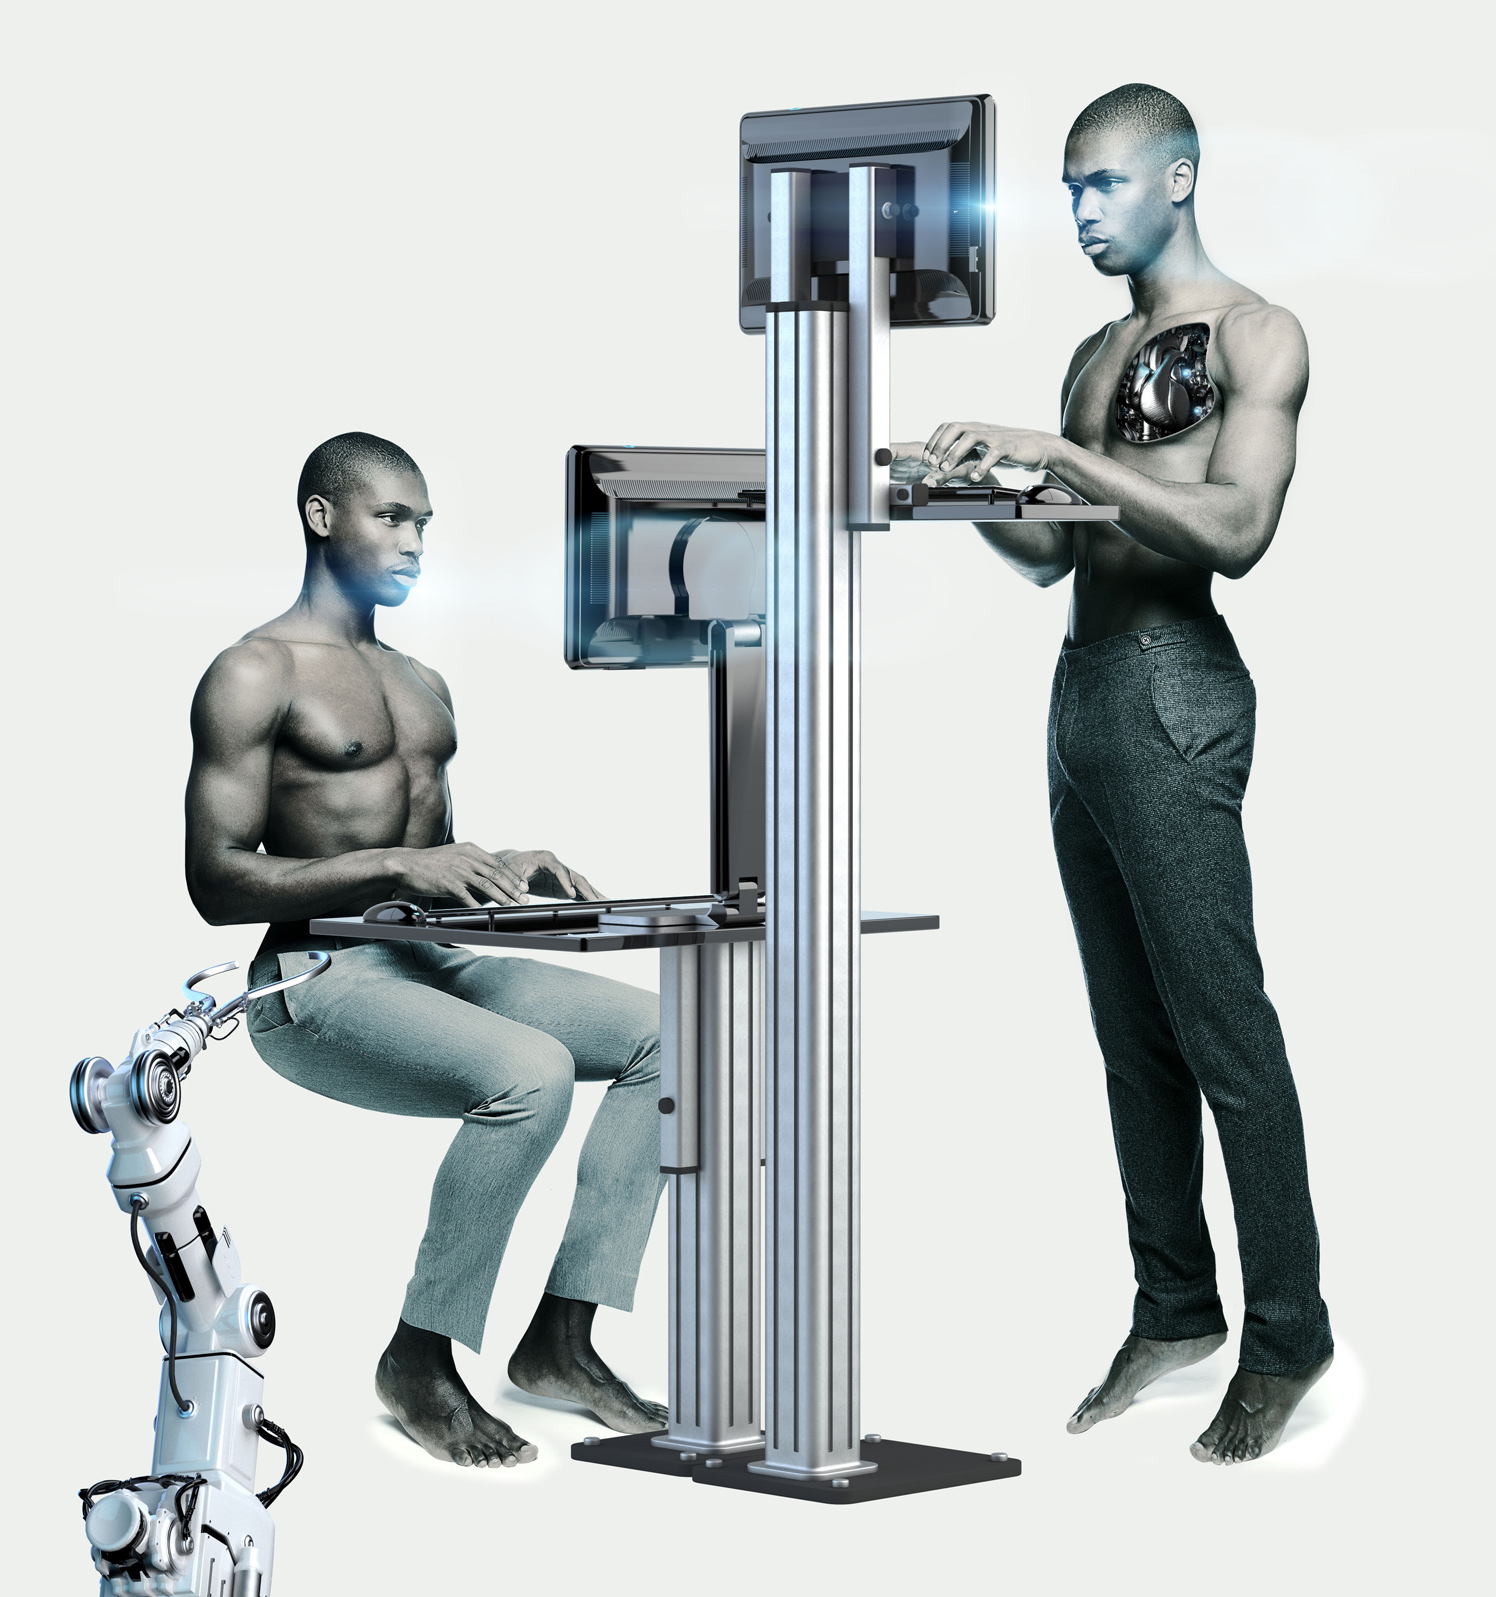 Lab Rats 2 / Men's Health Magazine